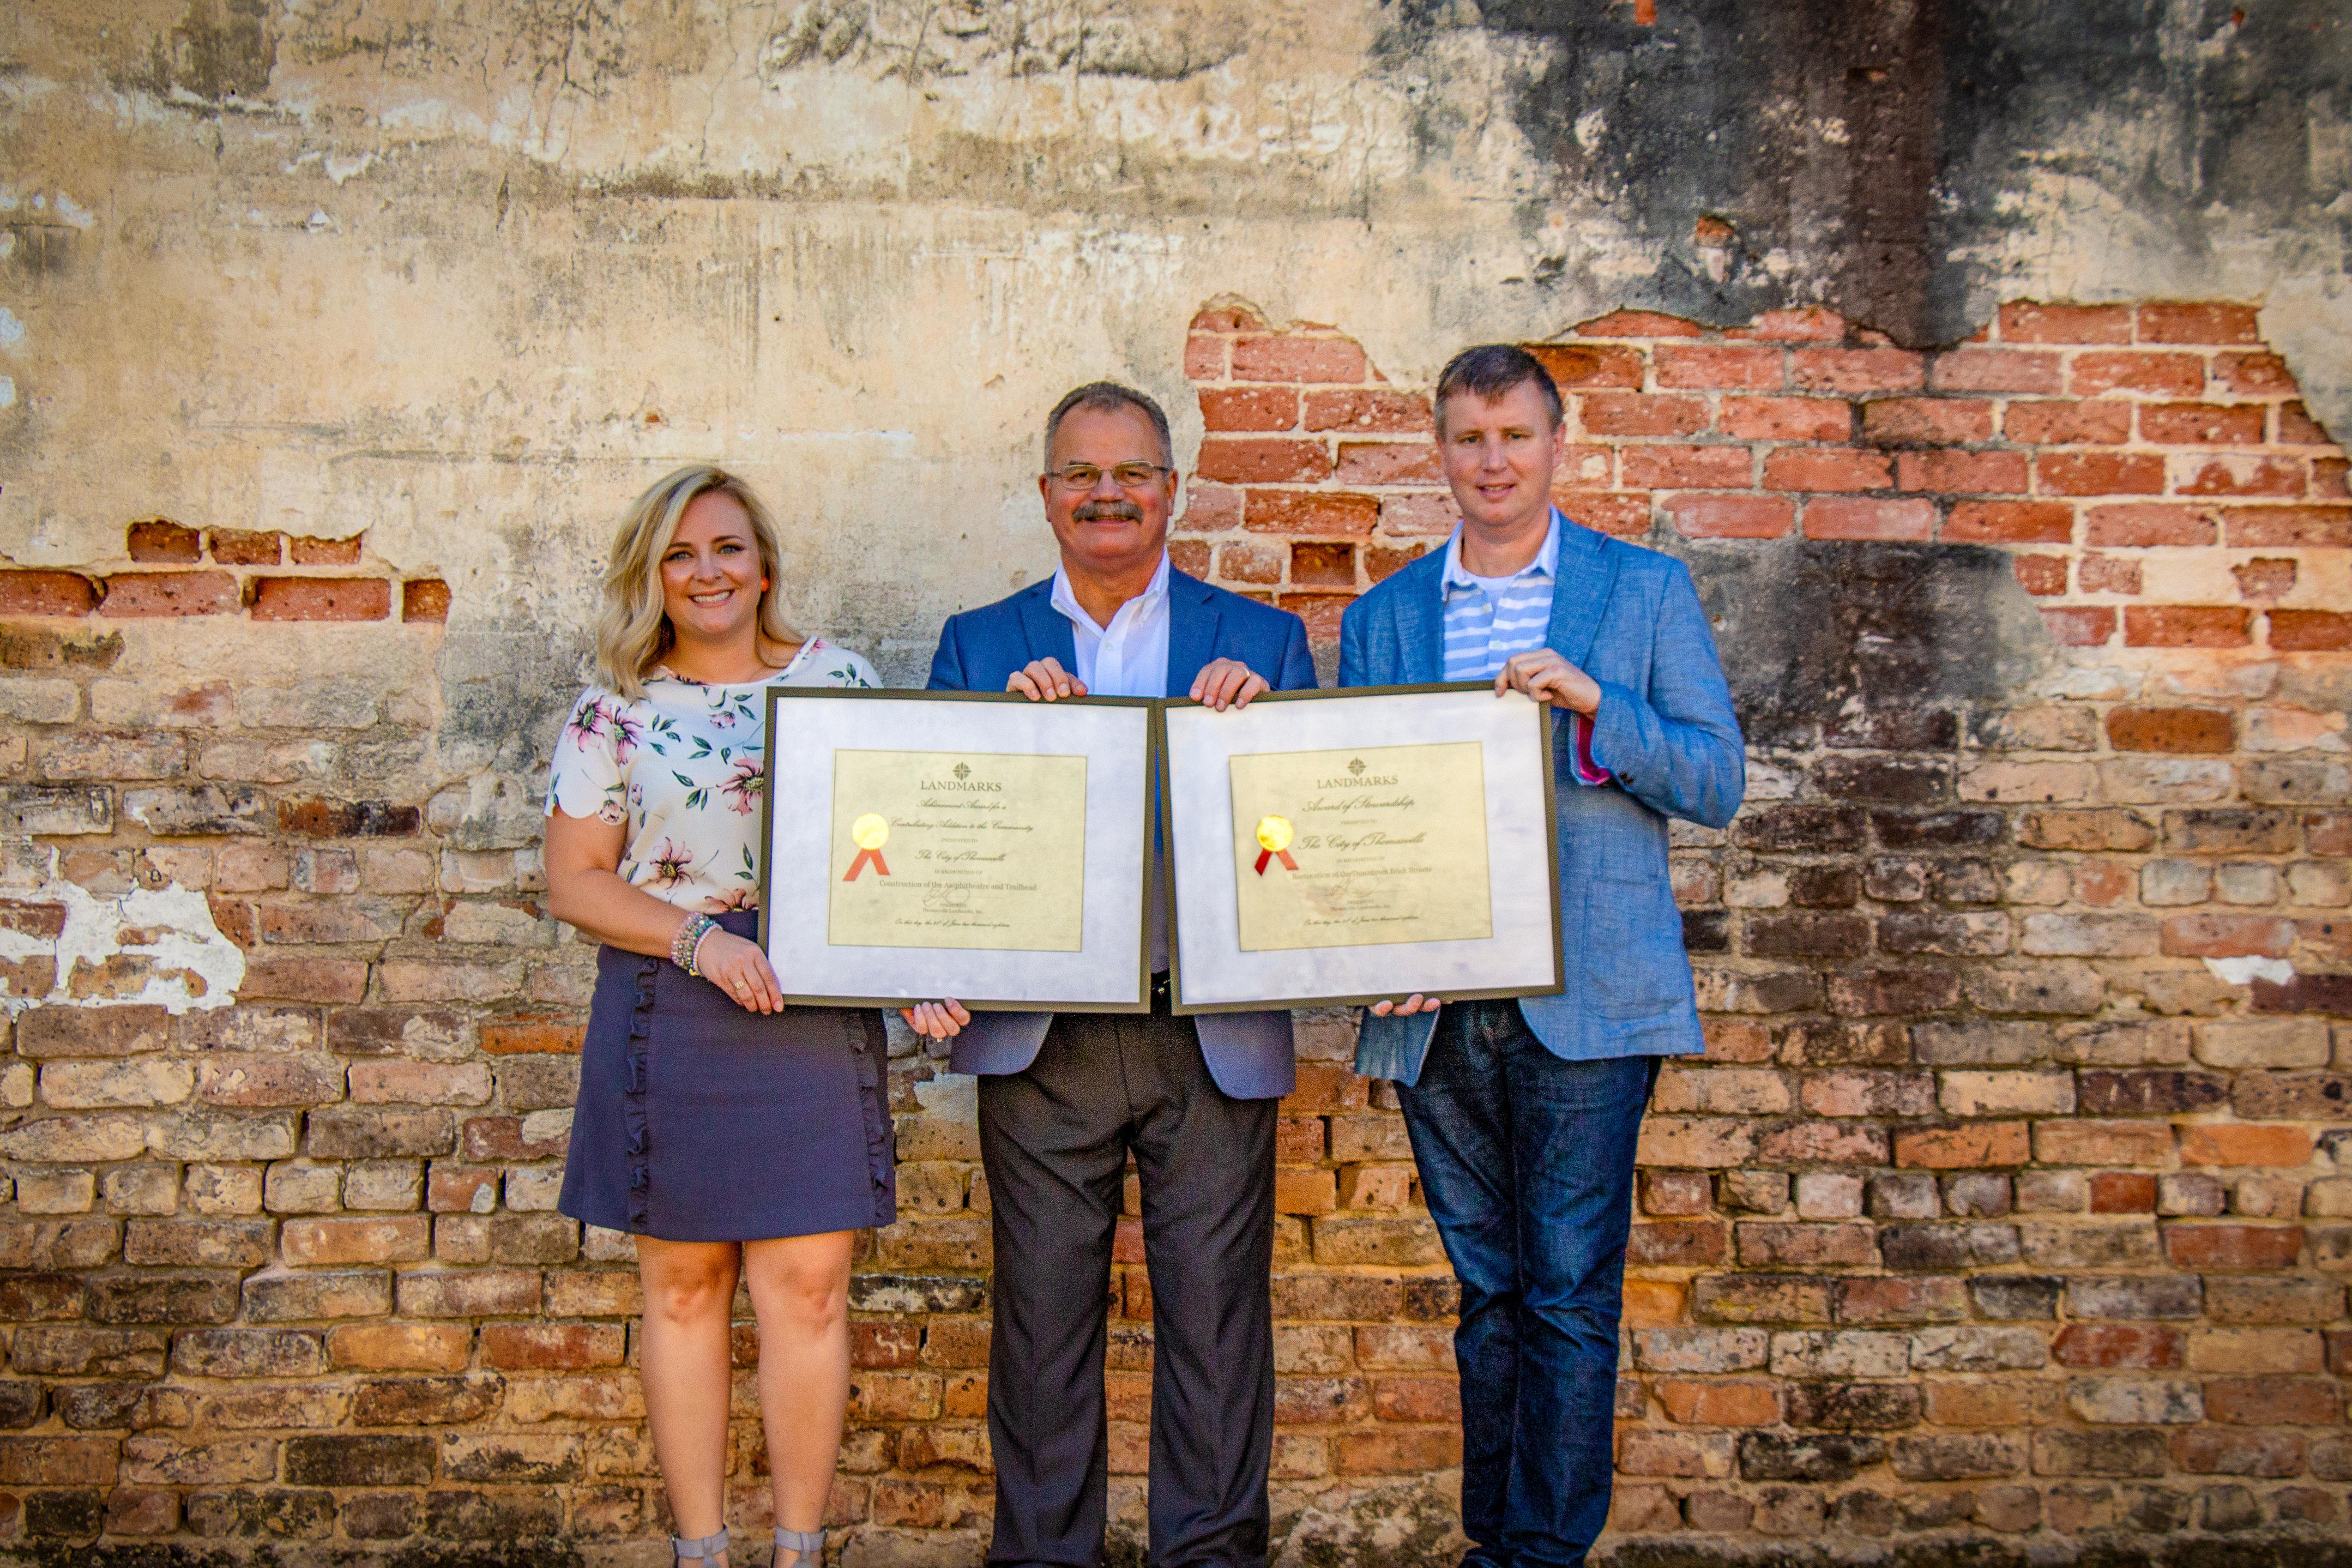 CITY RECEIVES TWO LANDMARKS AWARDS